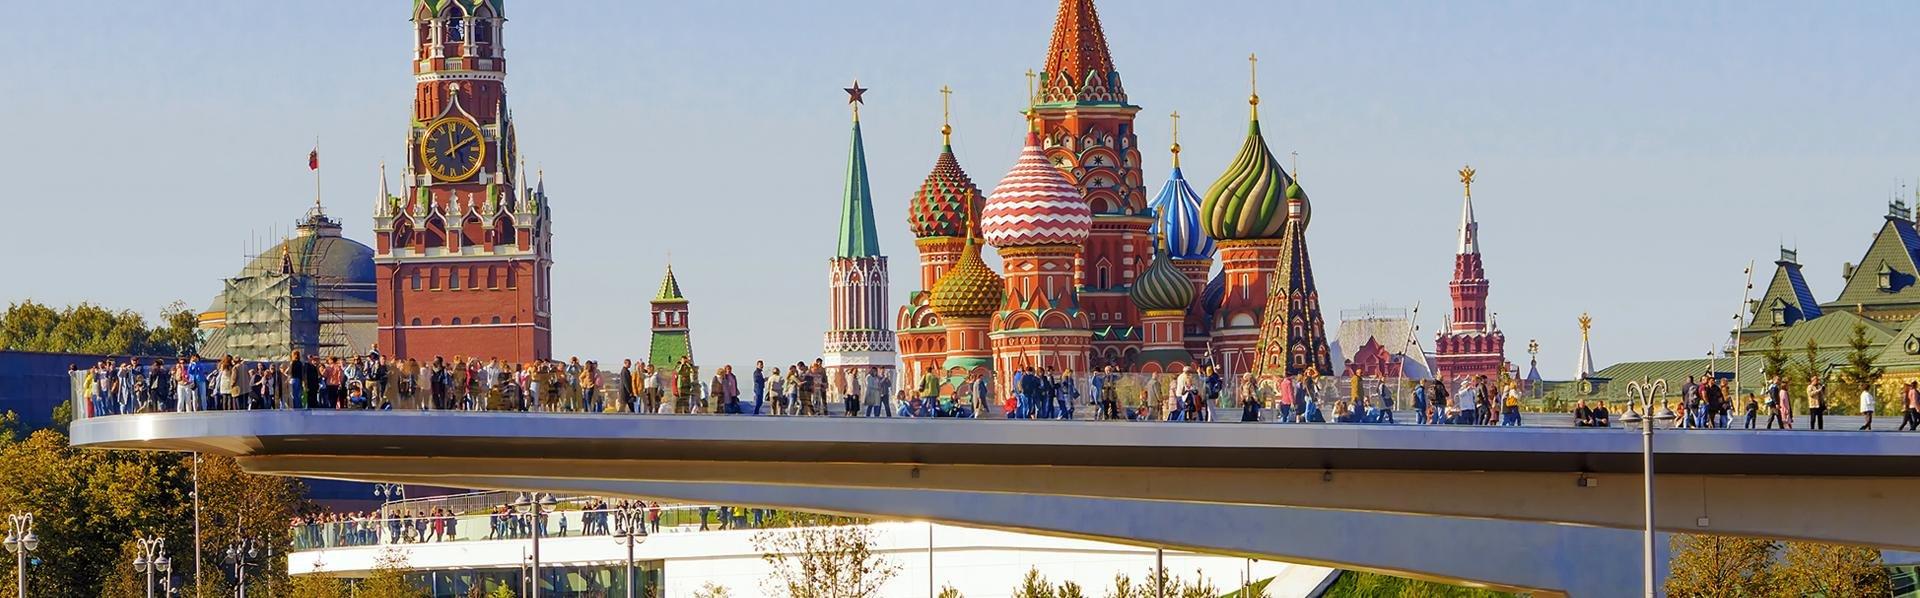 Zaryadye Park met Basiliuskathedraal in Moskou, Rusland